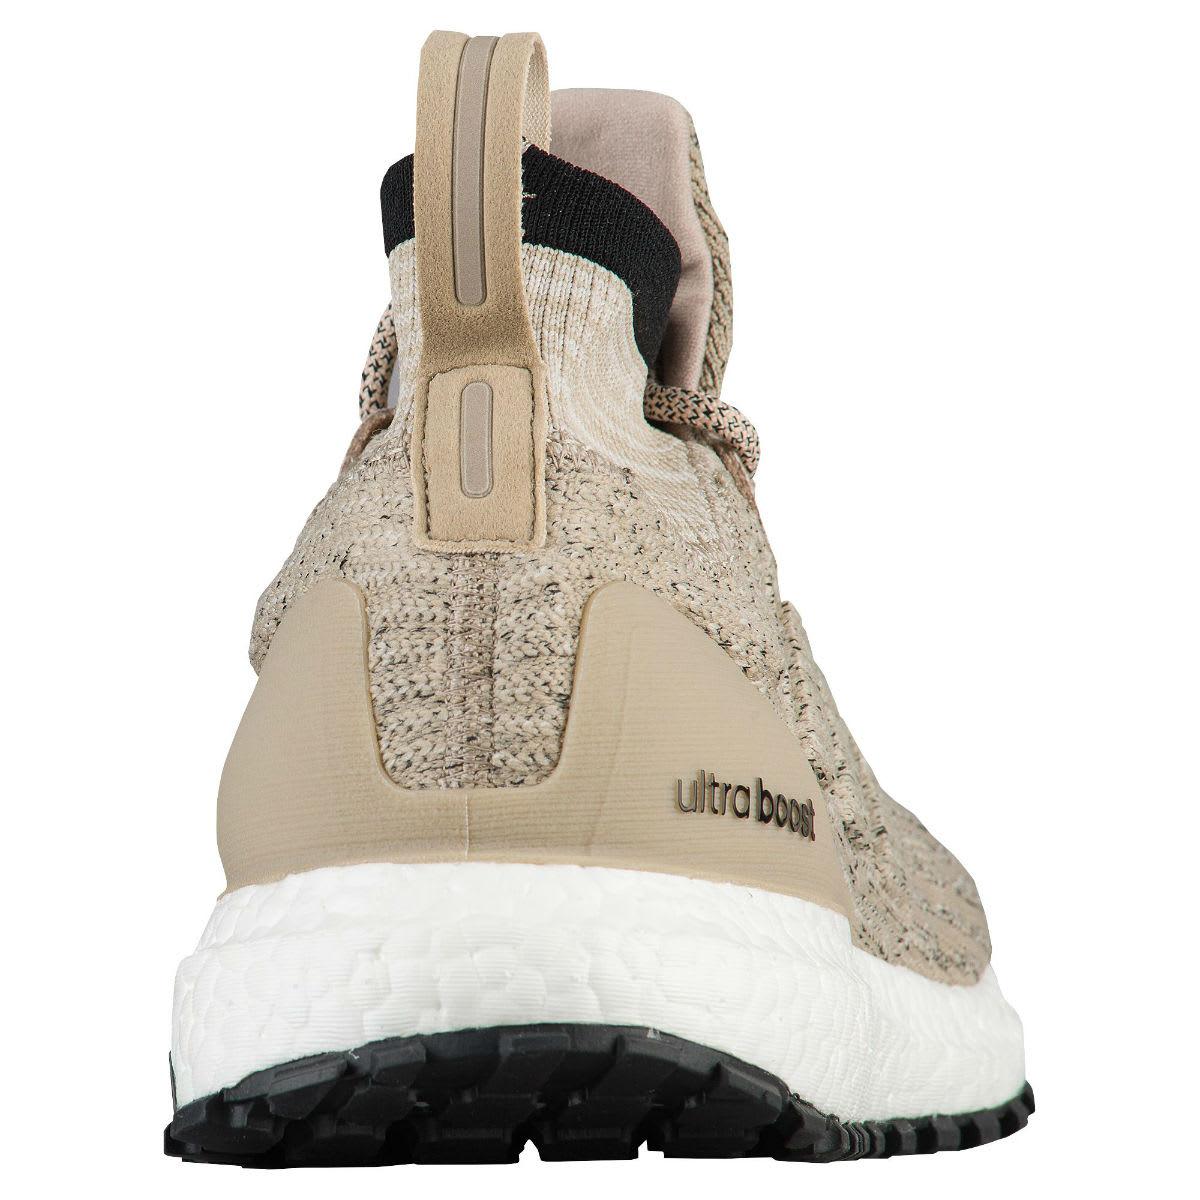 8cd714b9165ed ... 50% off adidas ultra boost atr mid trace khaki release date heel cg3001  197bc 9f085